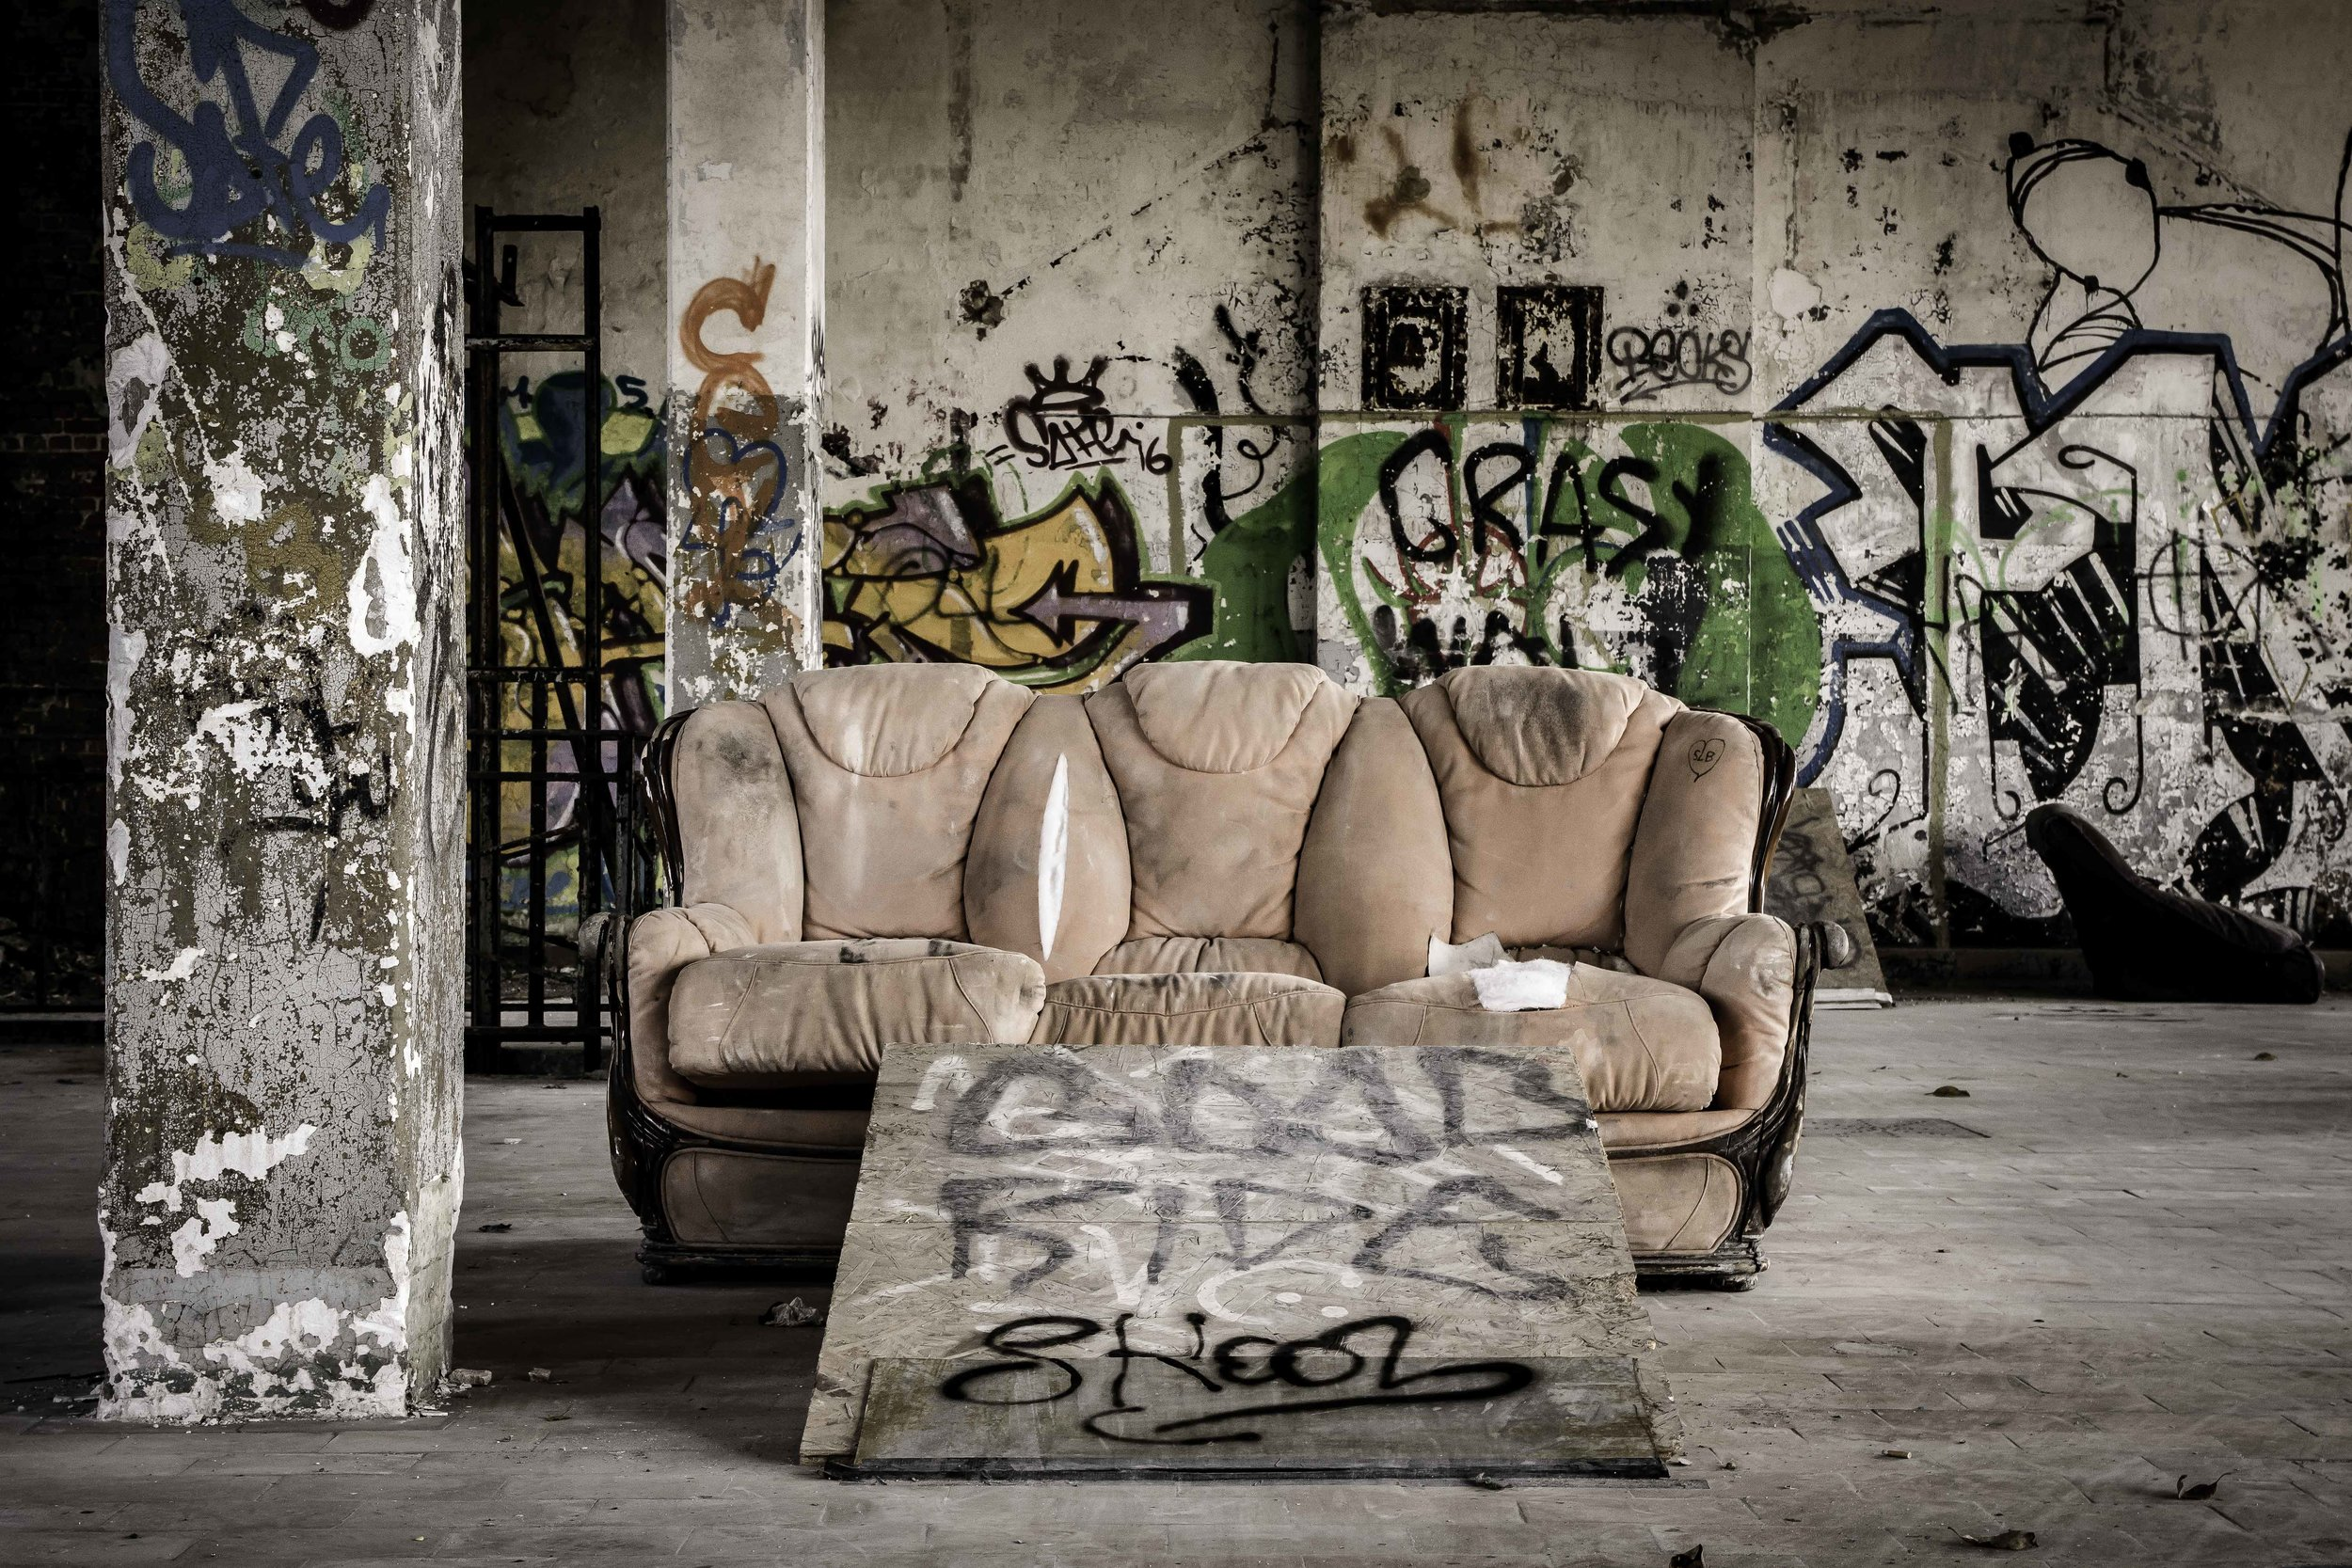 viewfinder-creativeboody-verlaten-gebouwen-fotograferen-buurt-bastogne-vroeger-opleidingscentrum-SNCB-urbex-fotografie-belgie-1